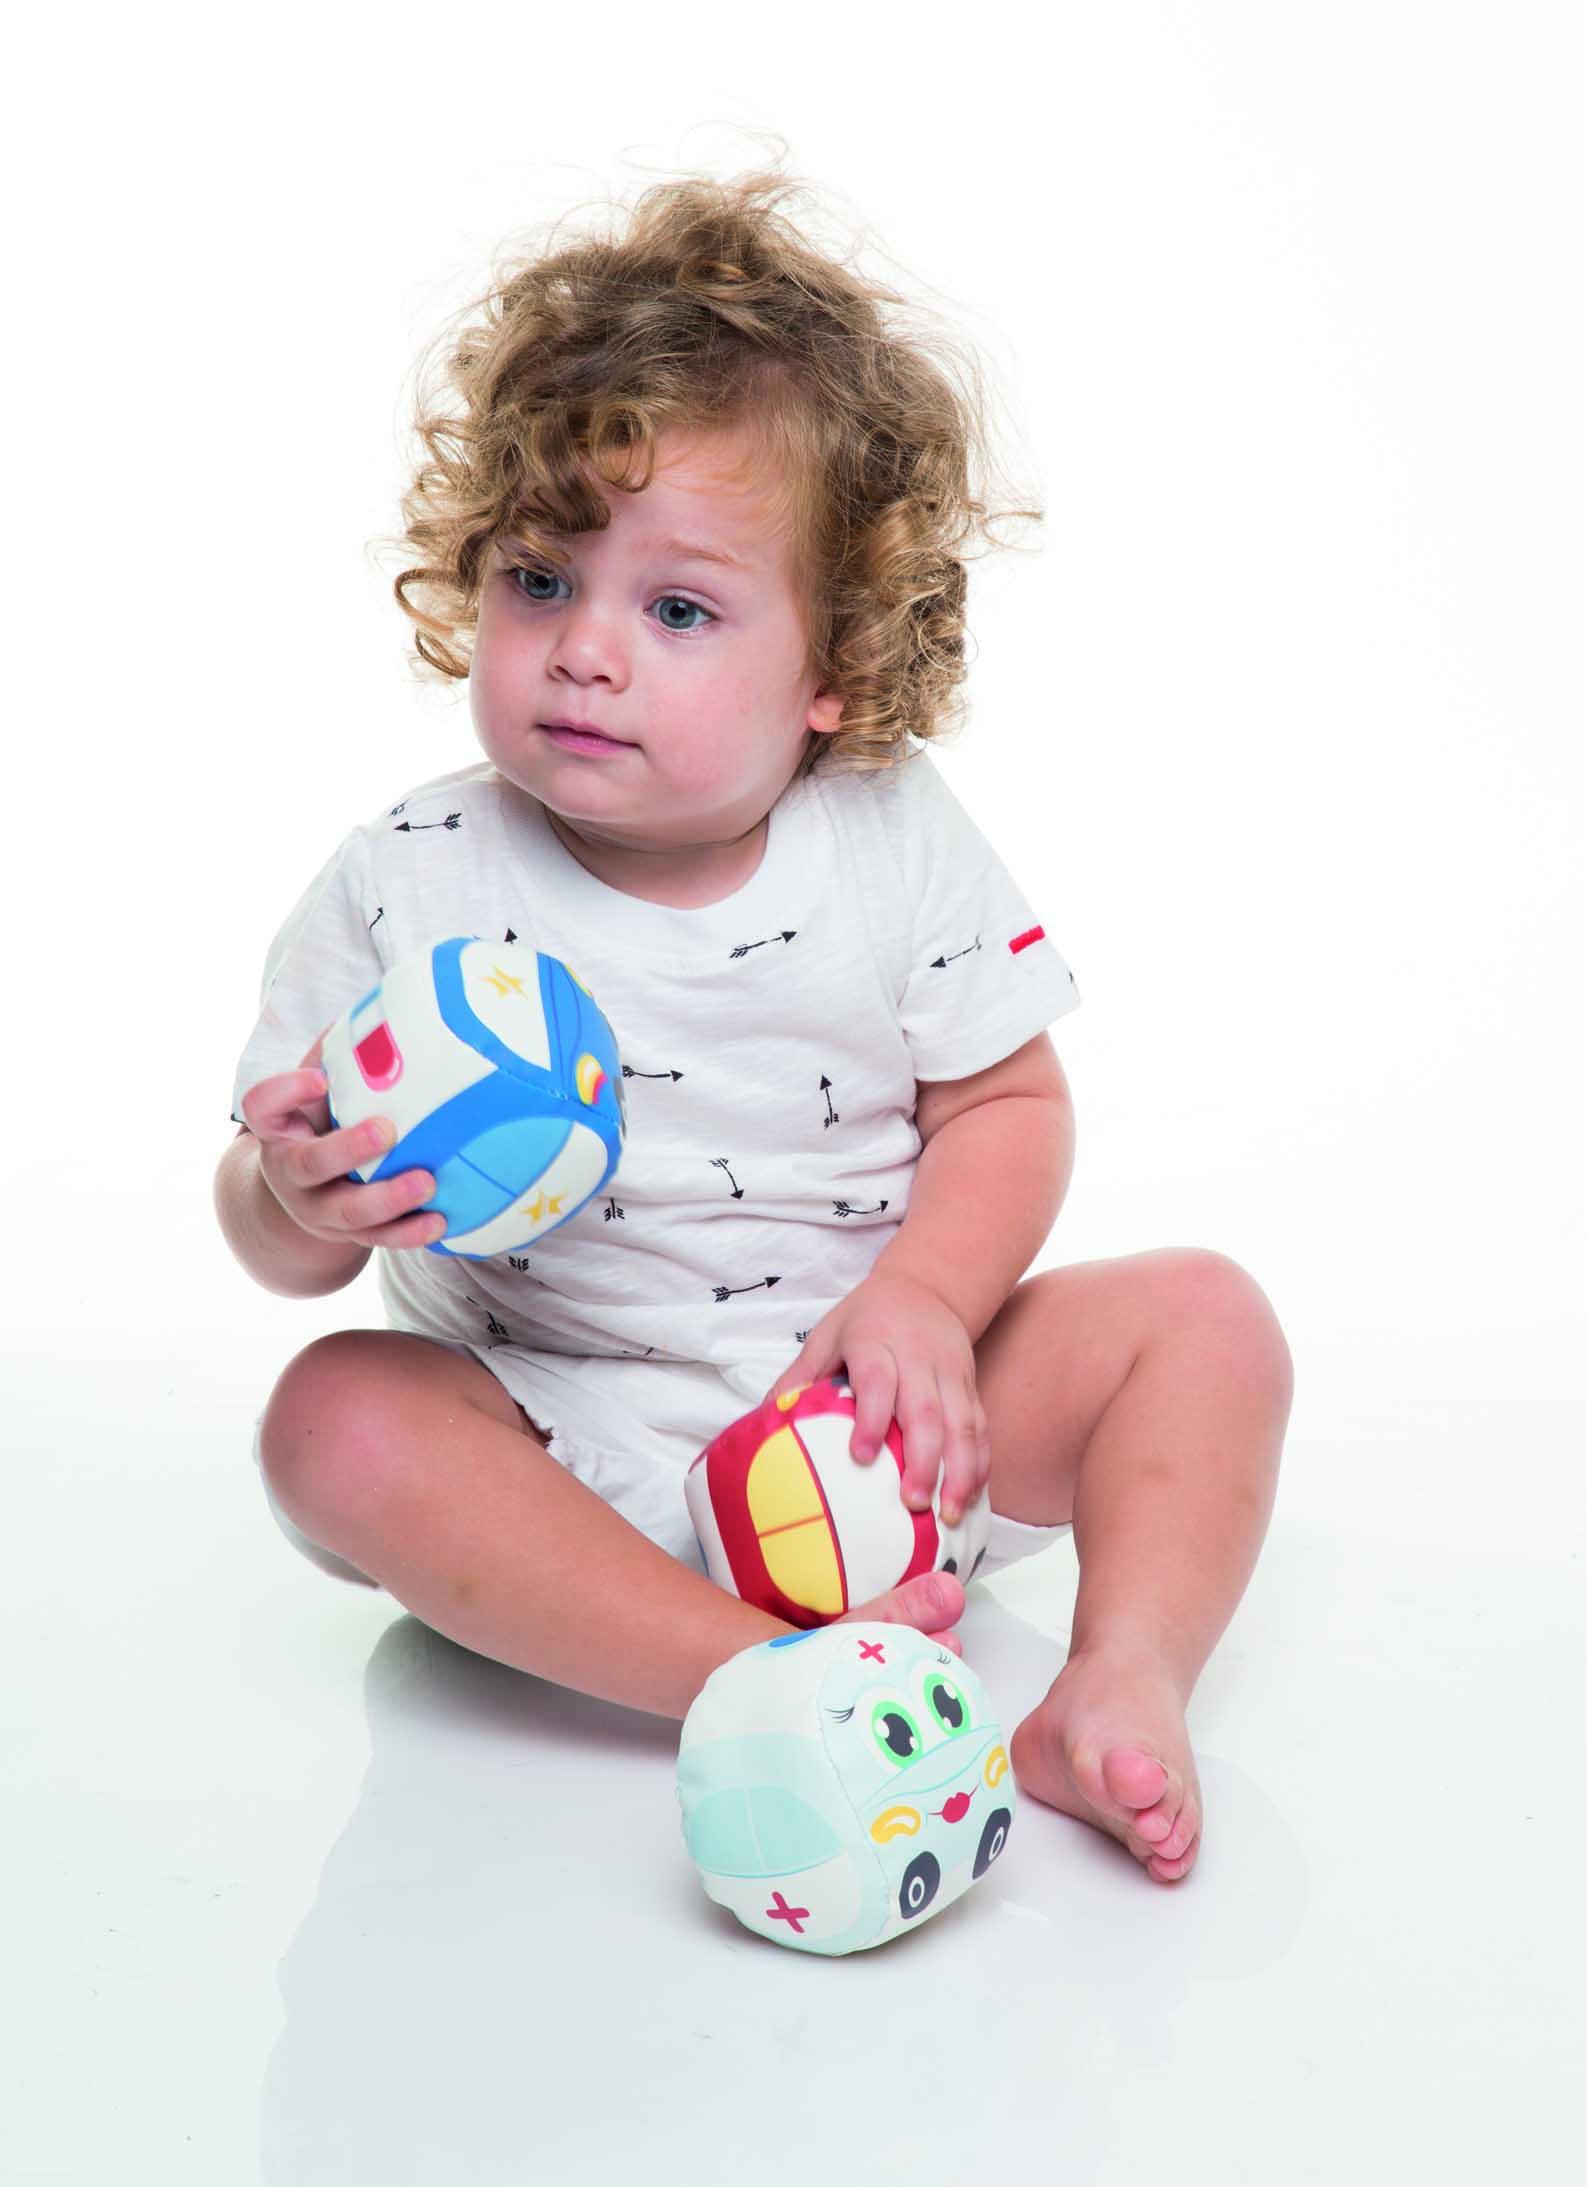 Baby to Love Μπαλίτσες αυτοκινητάκια - moms.gr 452c559857c